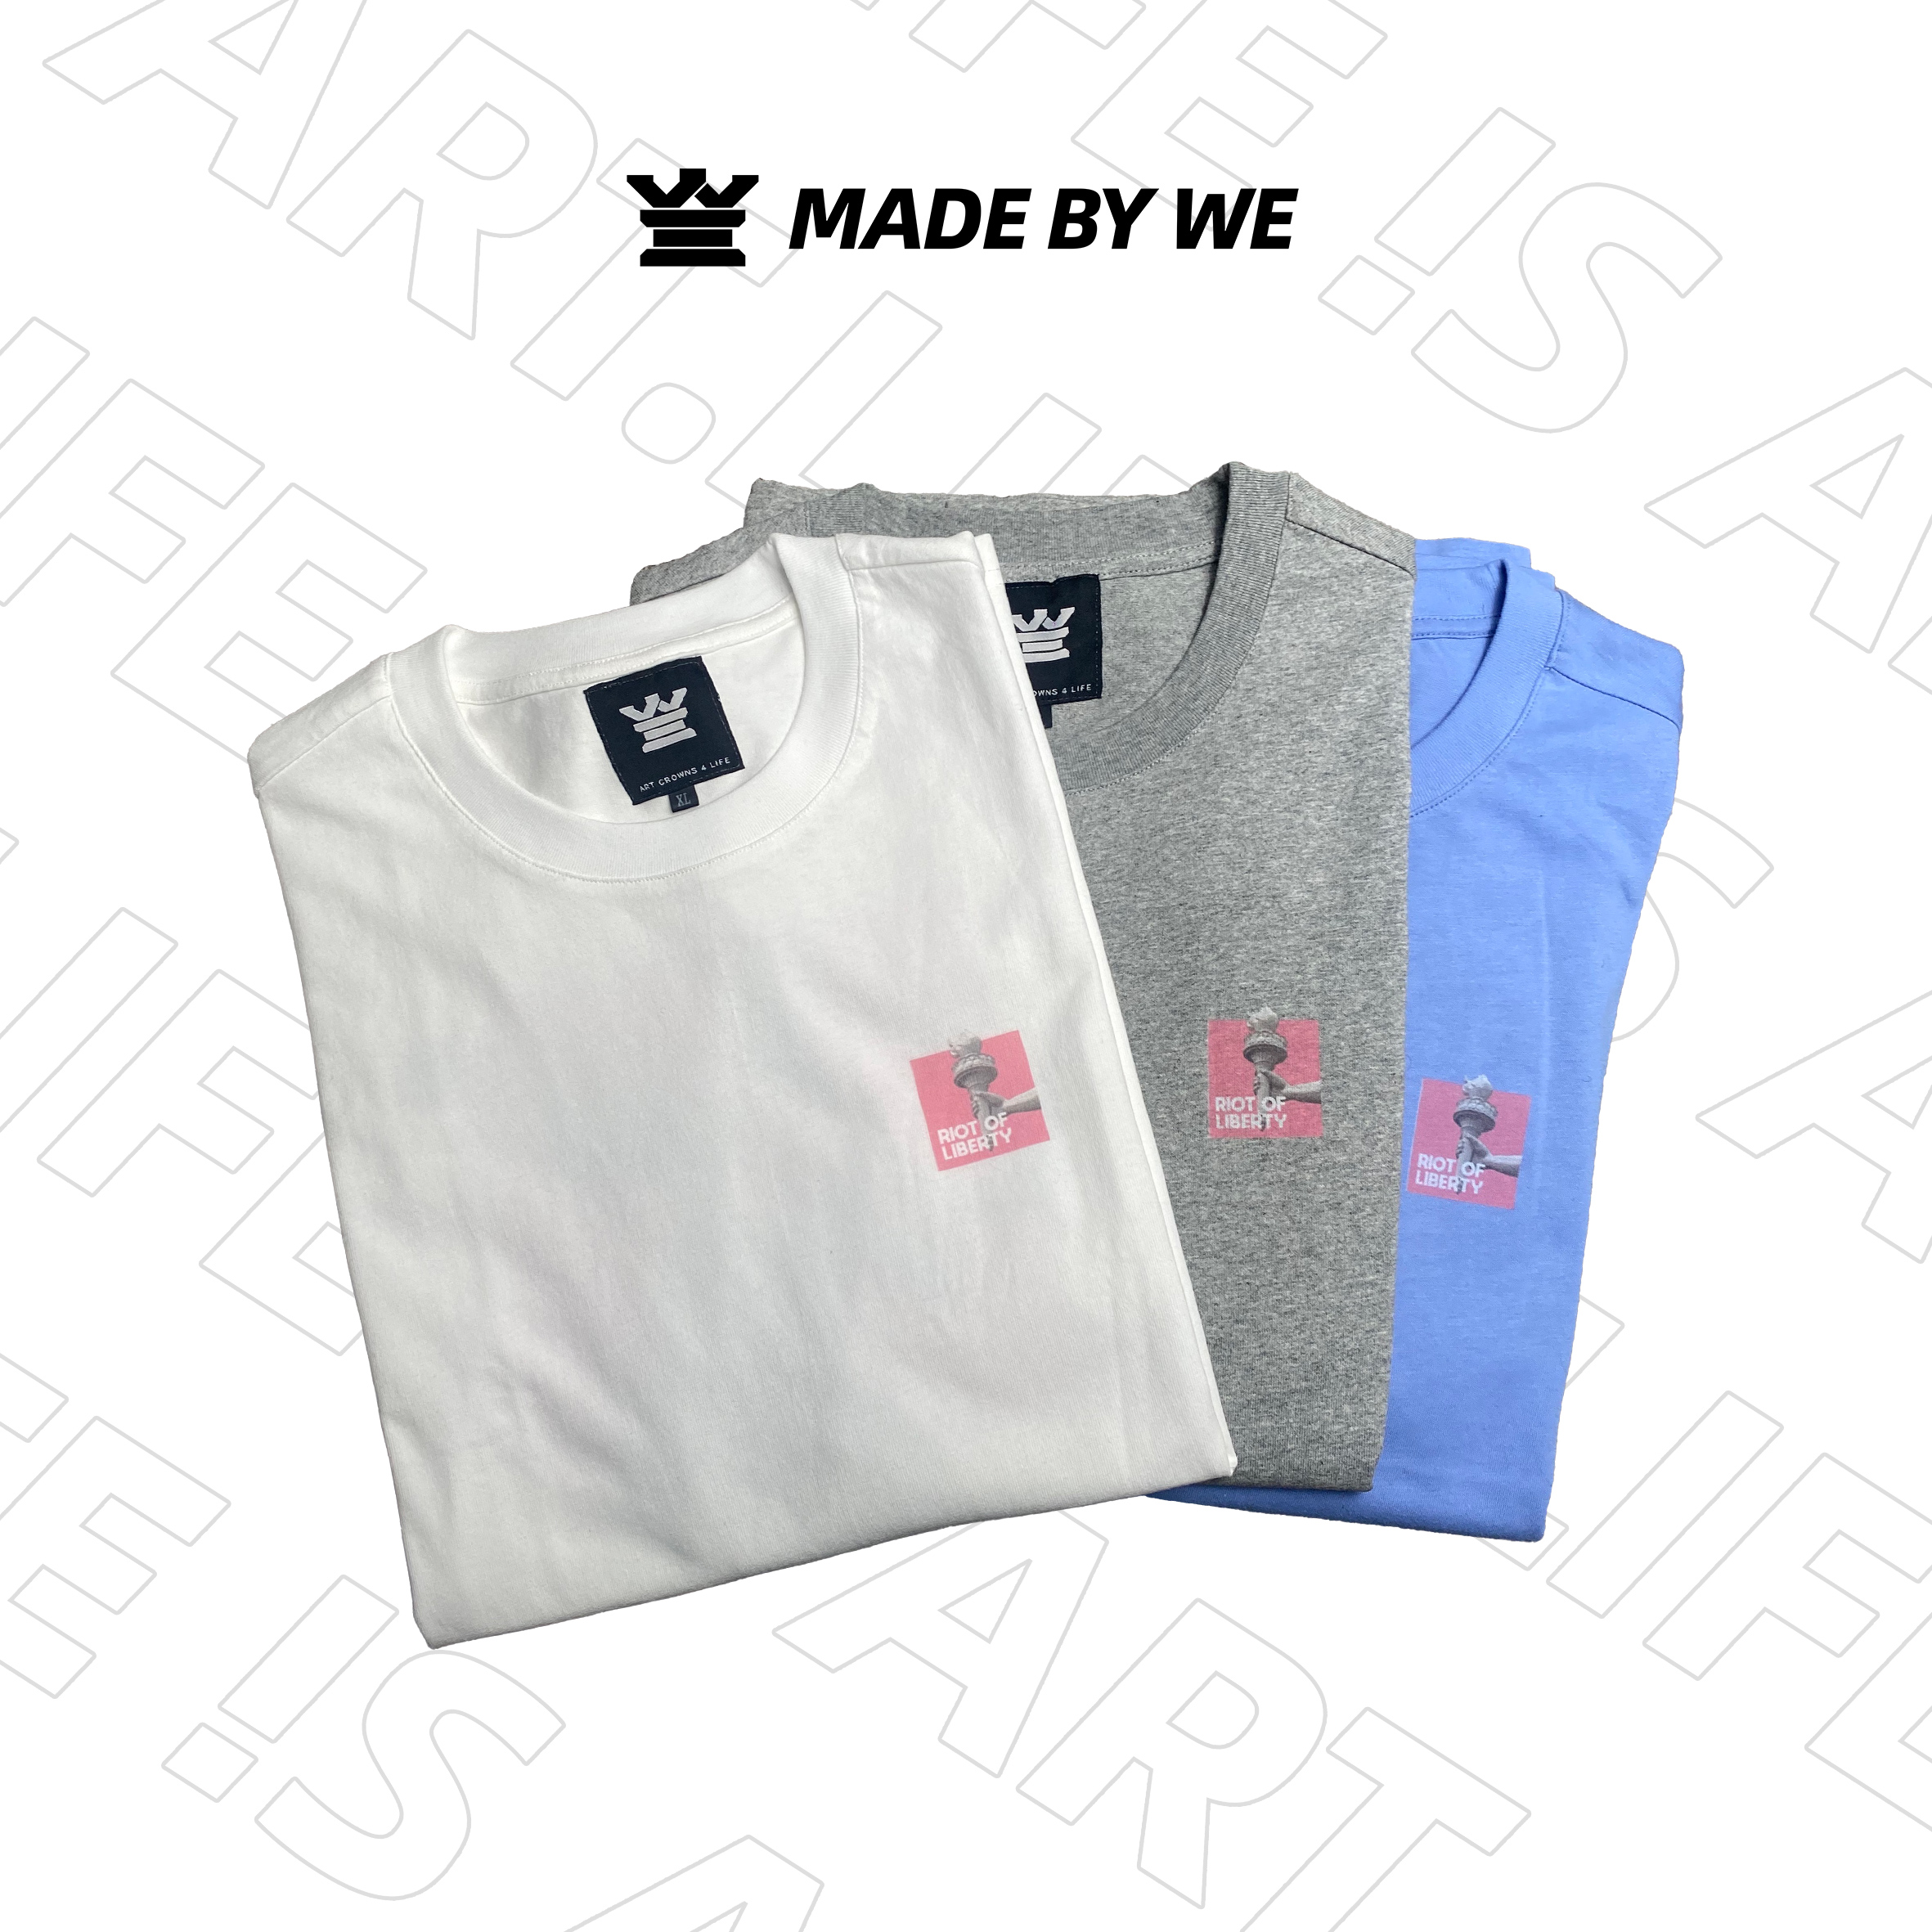 LA2021RIOT新款纯棉圆领短袖原创设计嘻哈街头风自由女神